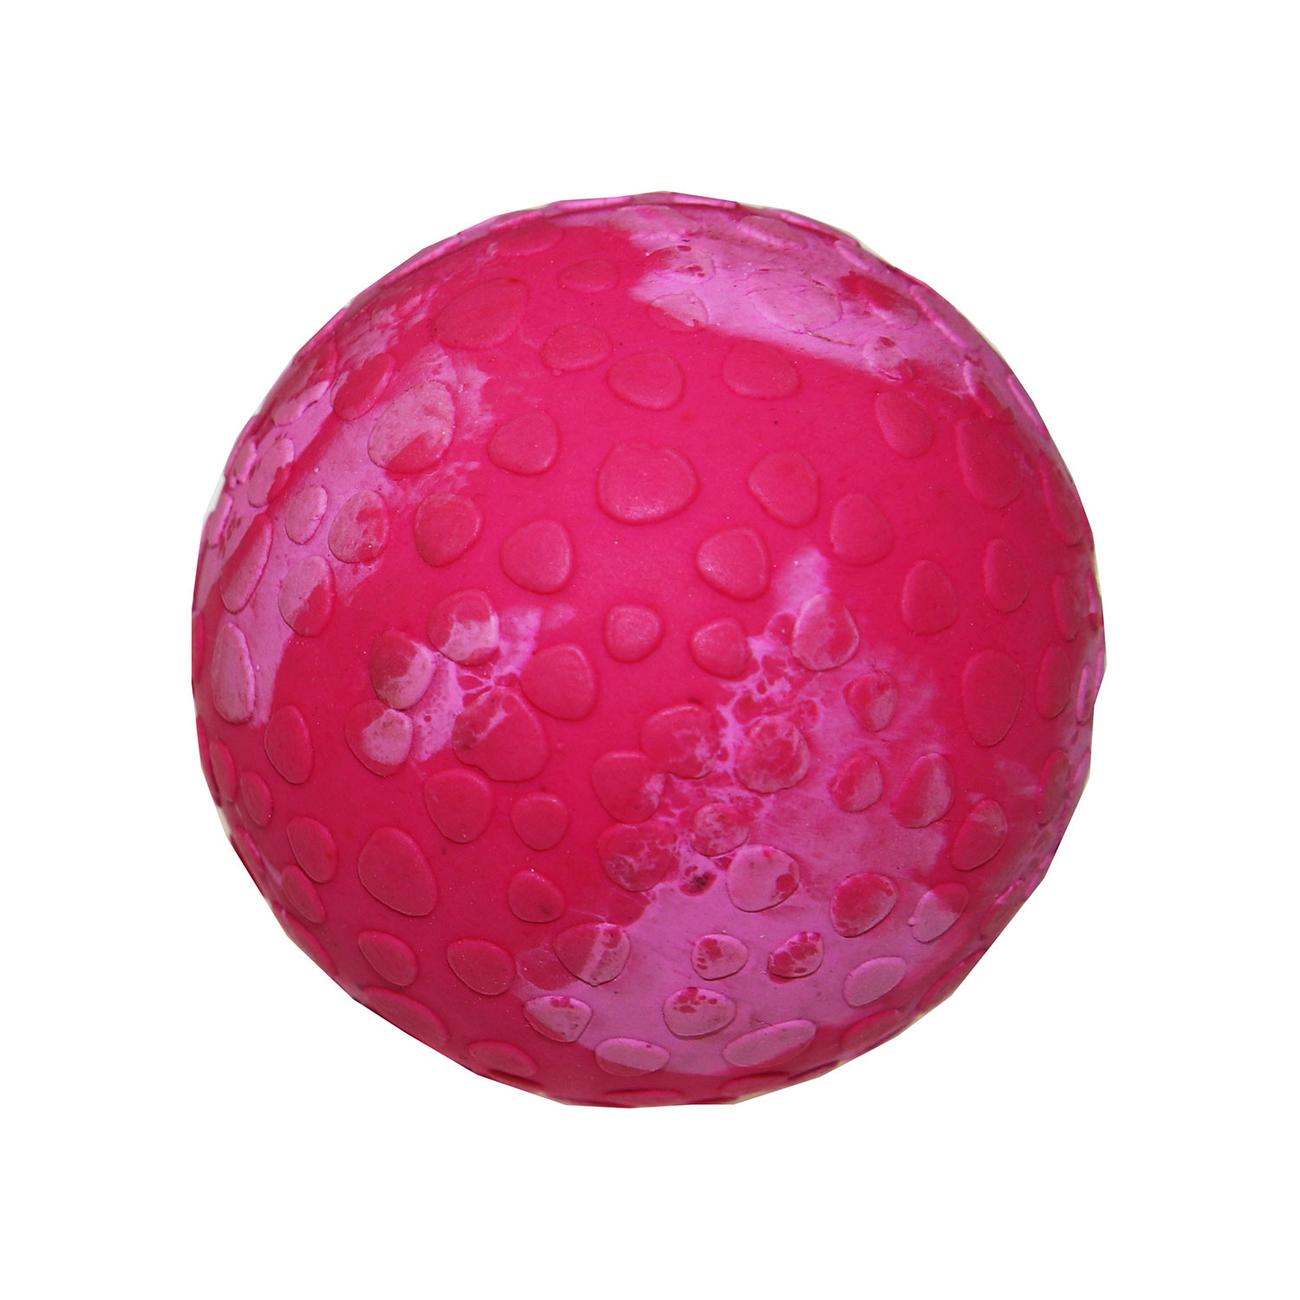 Wolters Aqua-Fun Wasserball Hundespielzeug, Bild 5